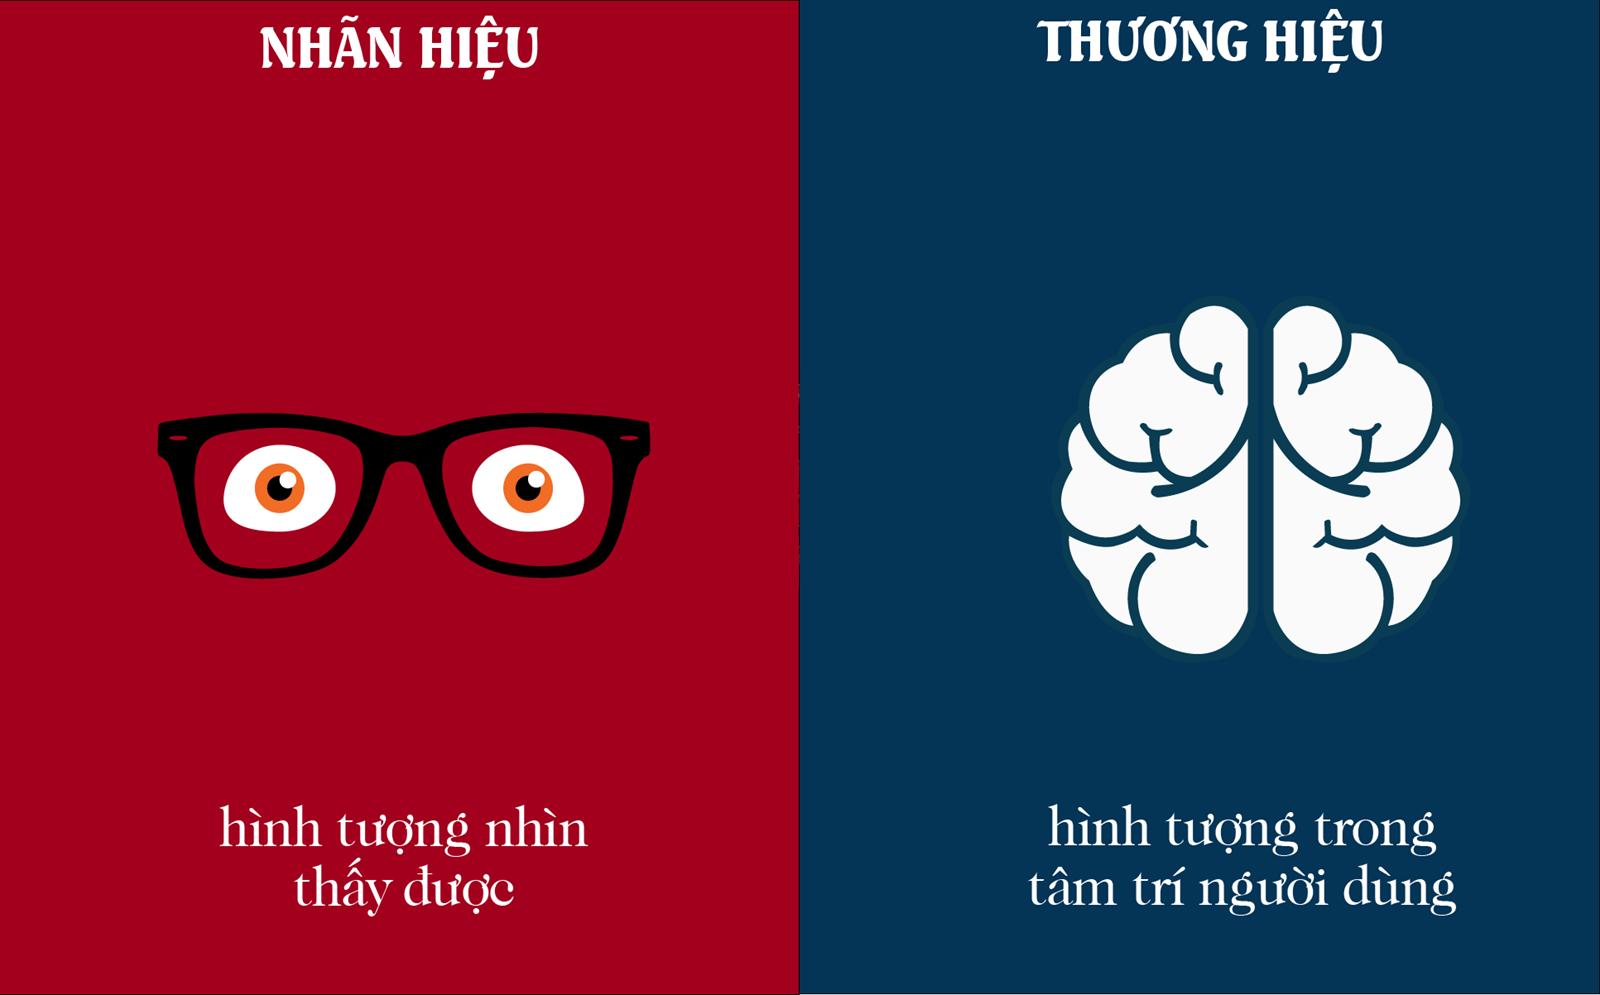 Hinh Tuong Ve Hang Hoa Trong Tam Tri Nguoi Tieu Dung